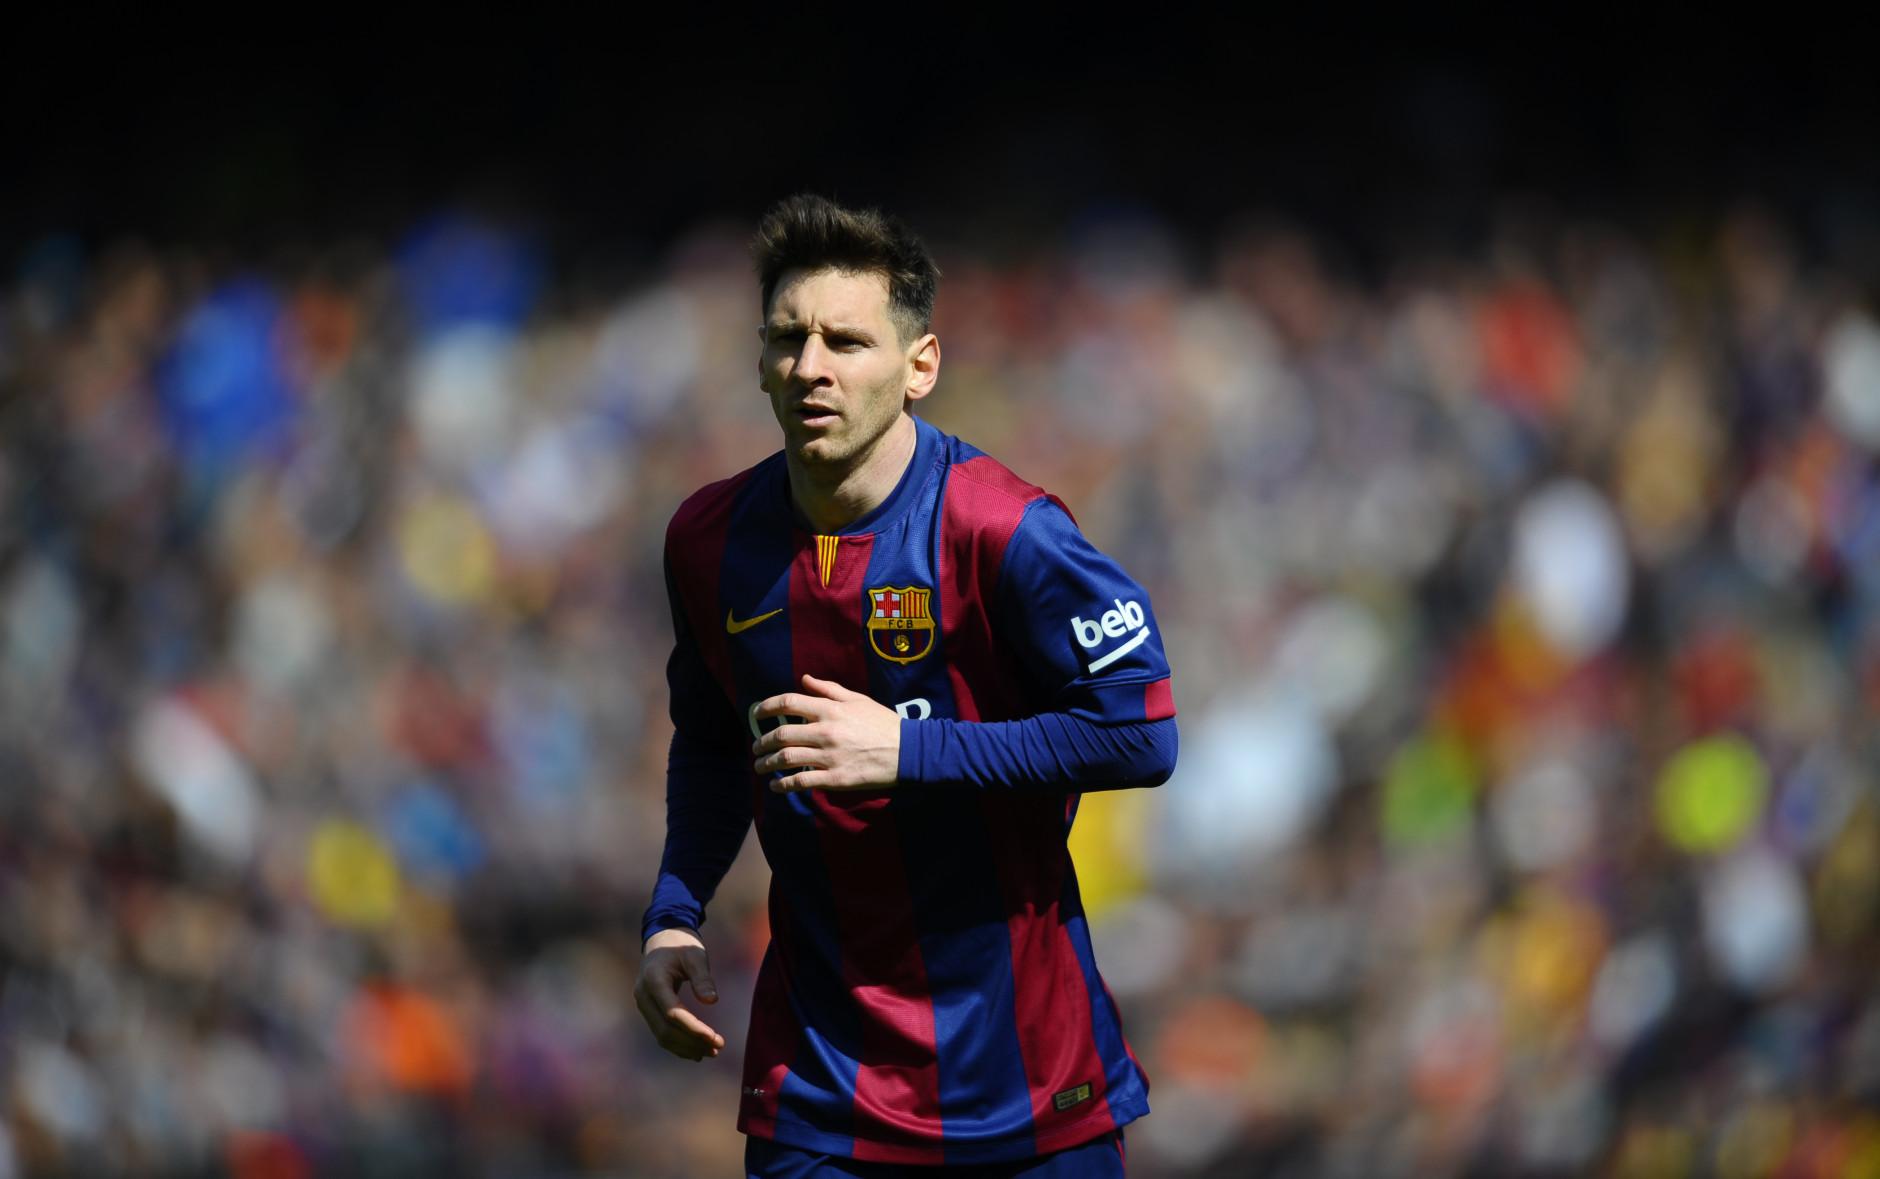 Soccer Players Messi Pelé Declares Mes...